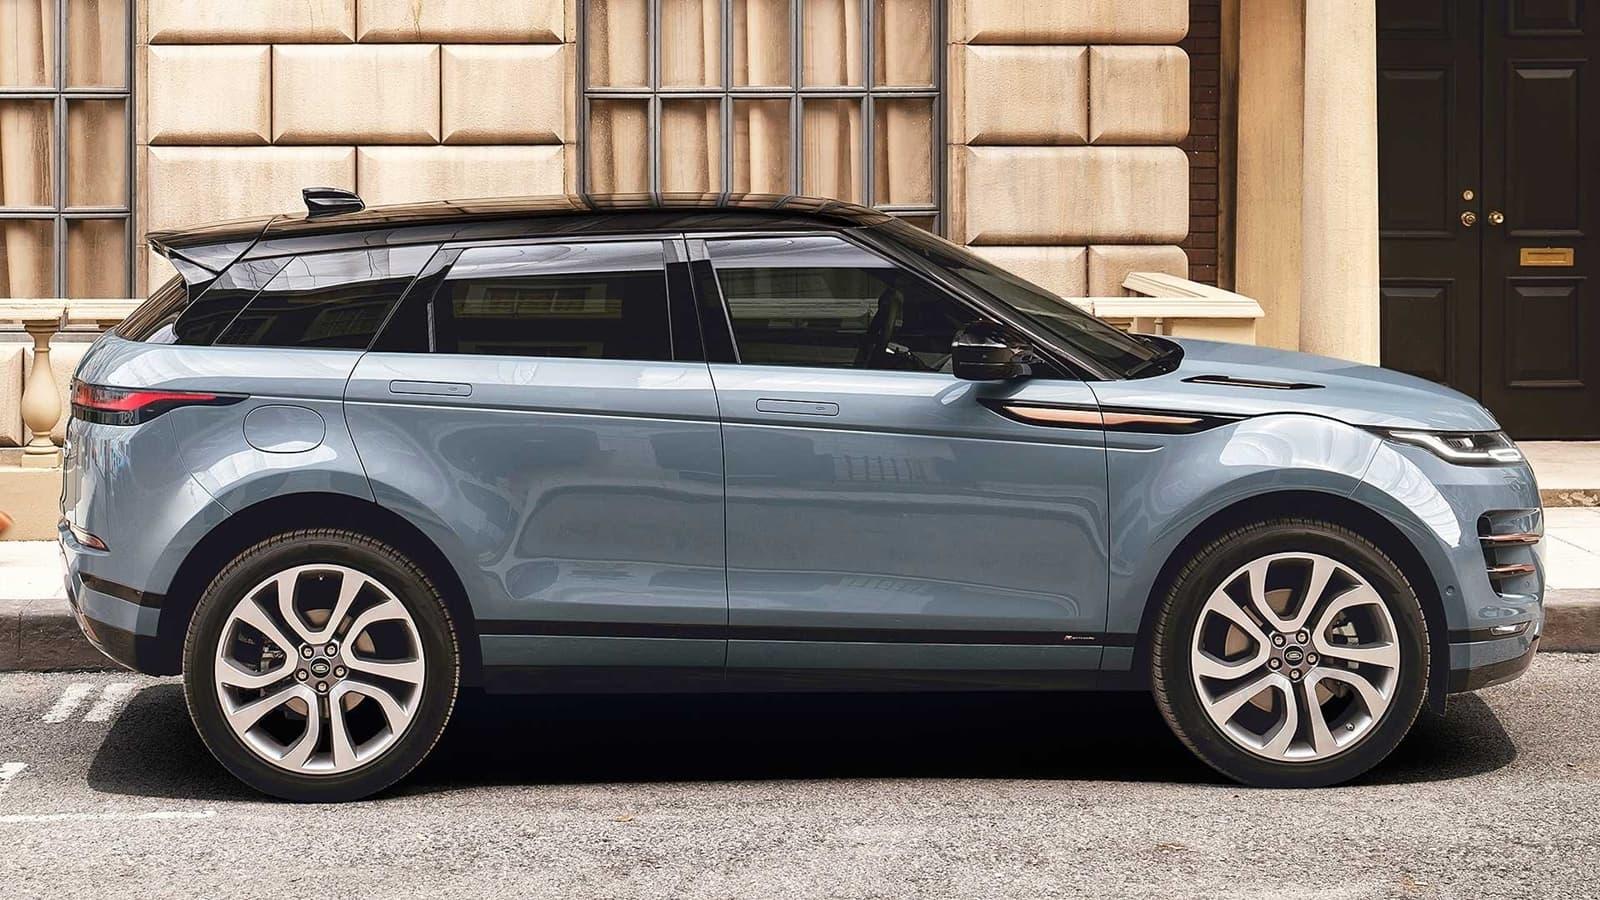 Range Rover Evoque 2019 1118 045